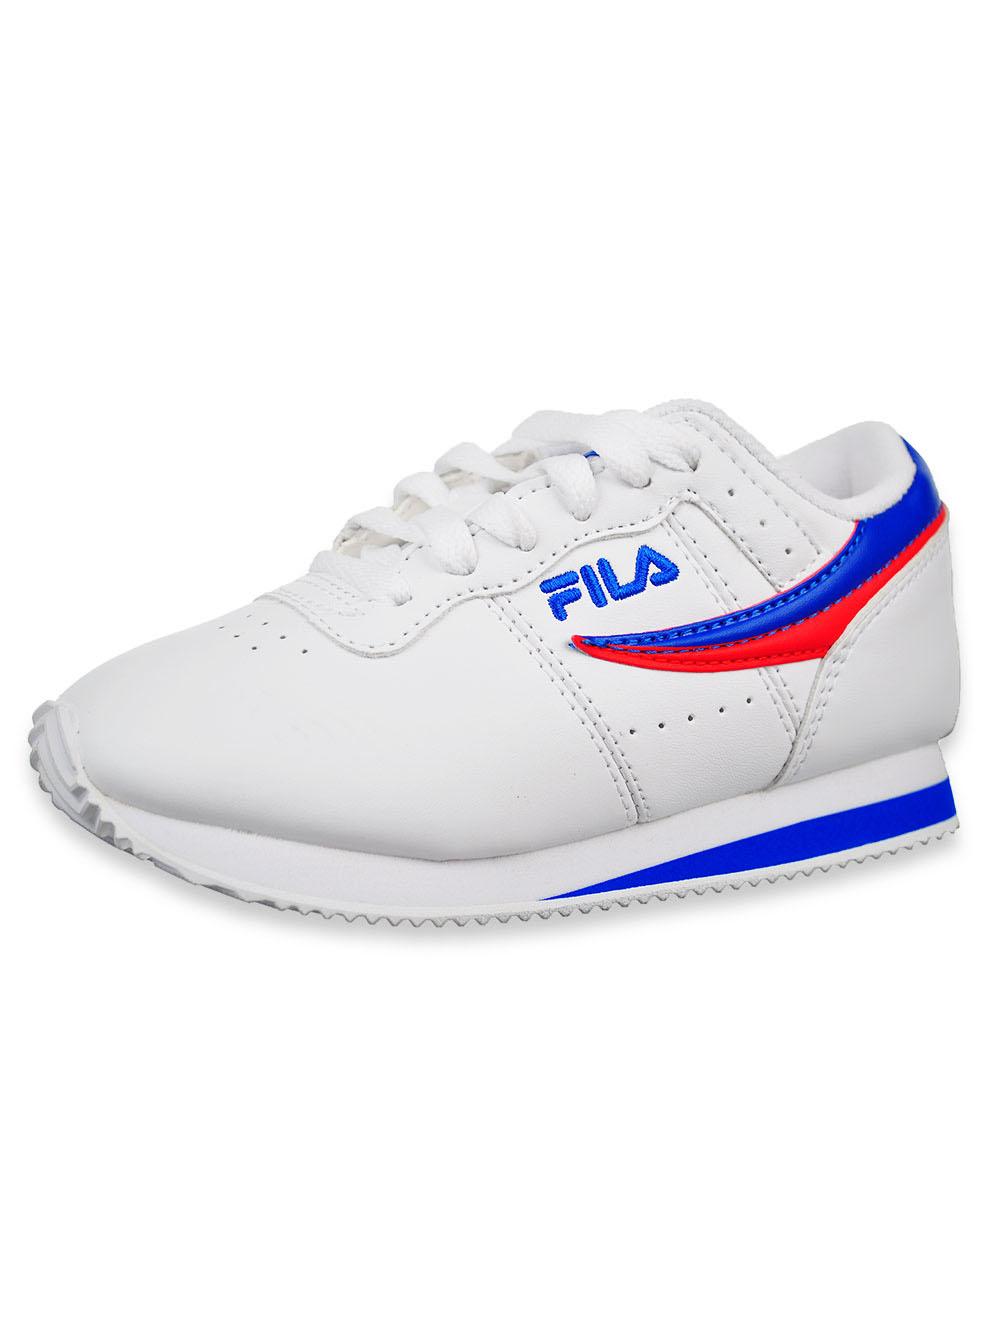 Girls' Machu Low Top Sneakers by Fila in Whiteredmulti